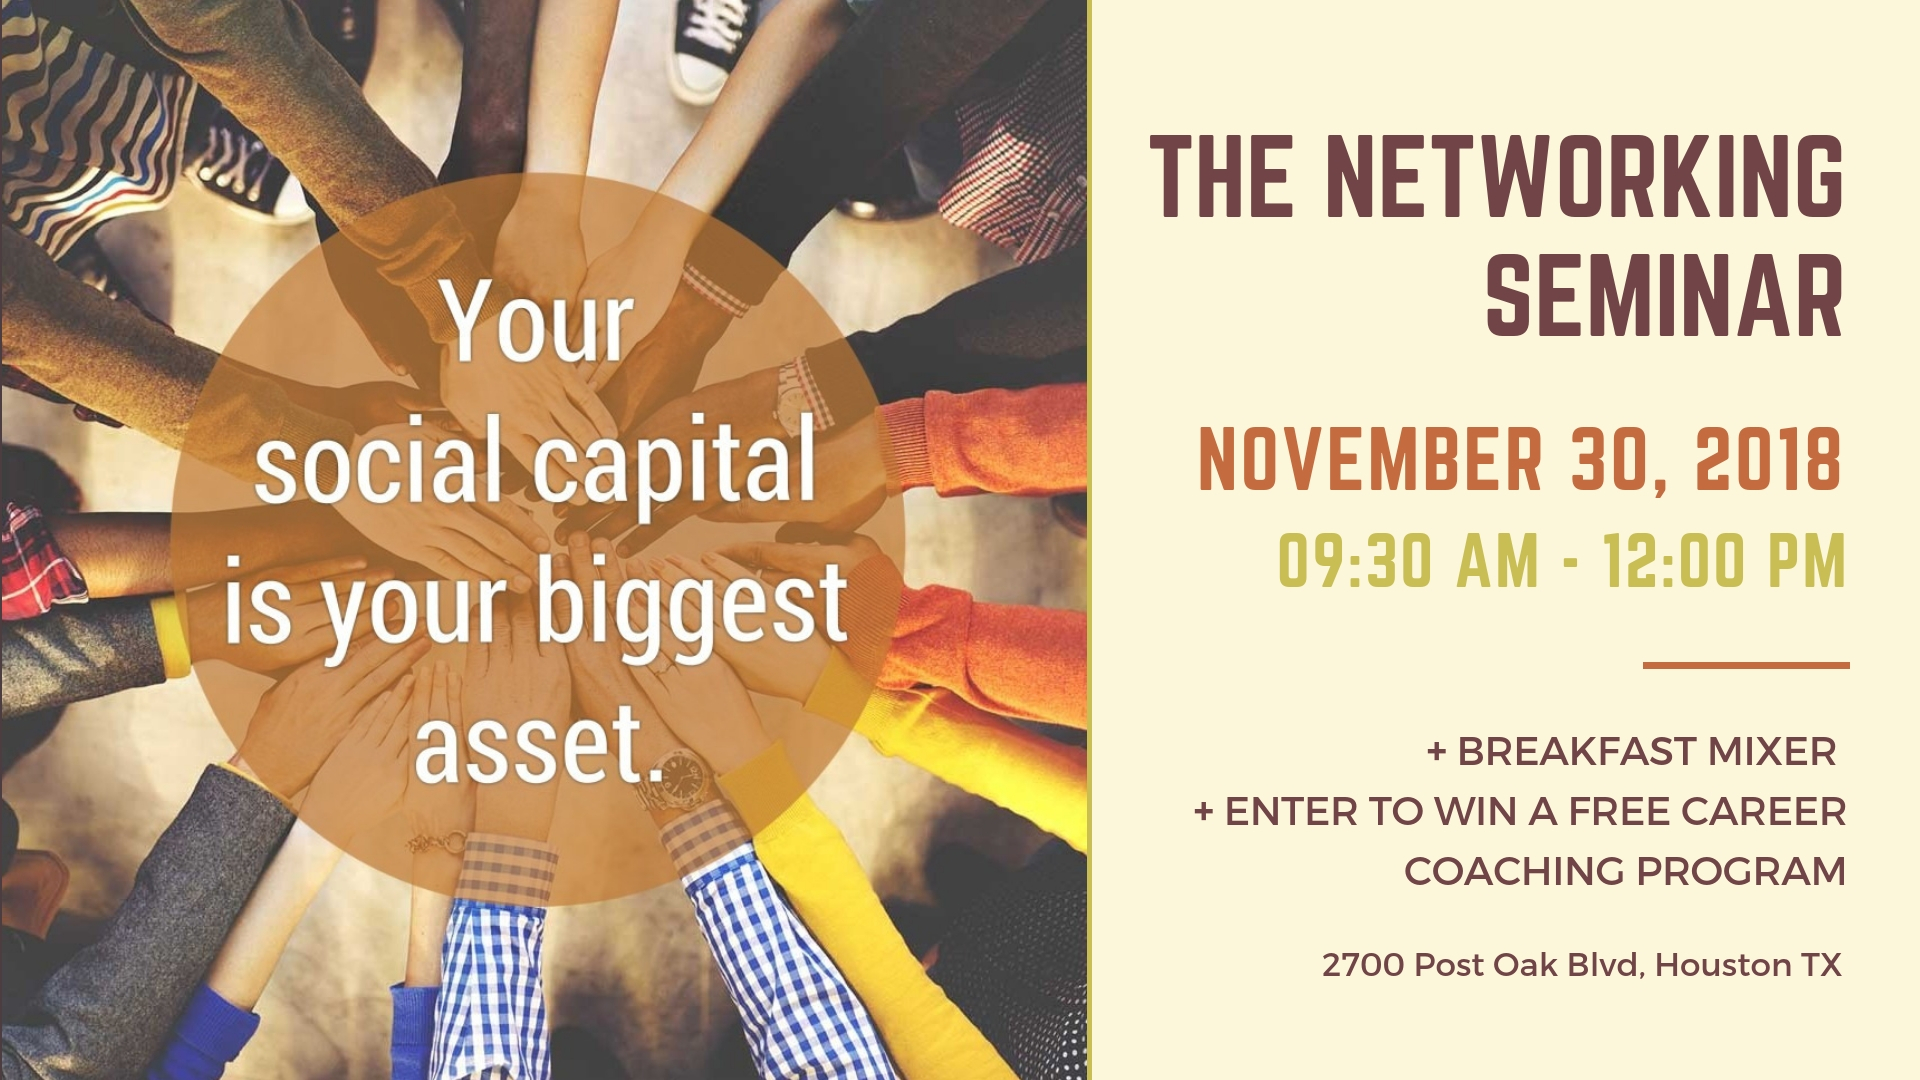 Networking Seminar Houston Nov 30.jpg